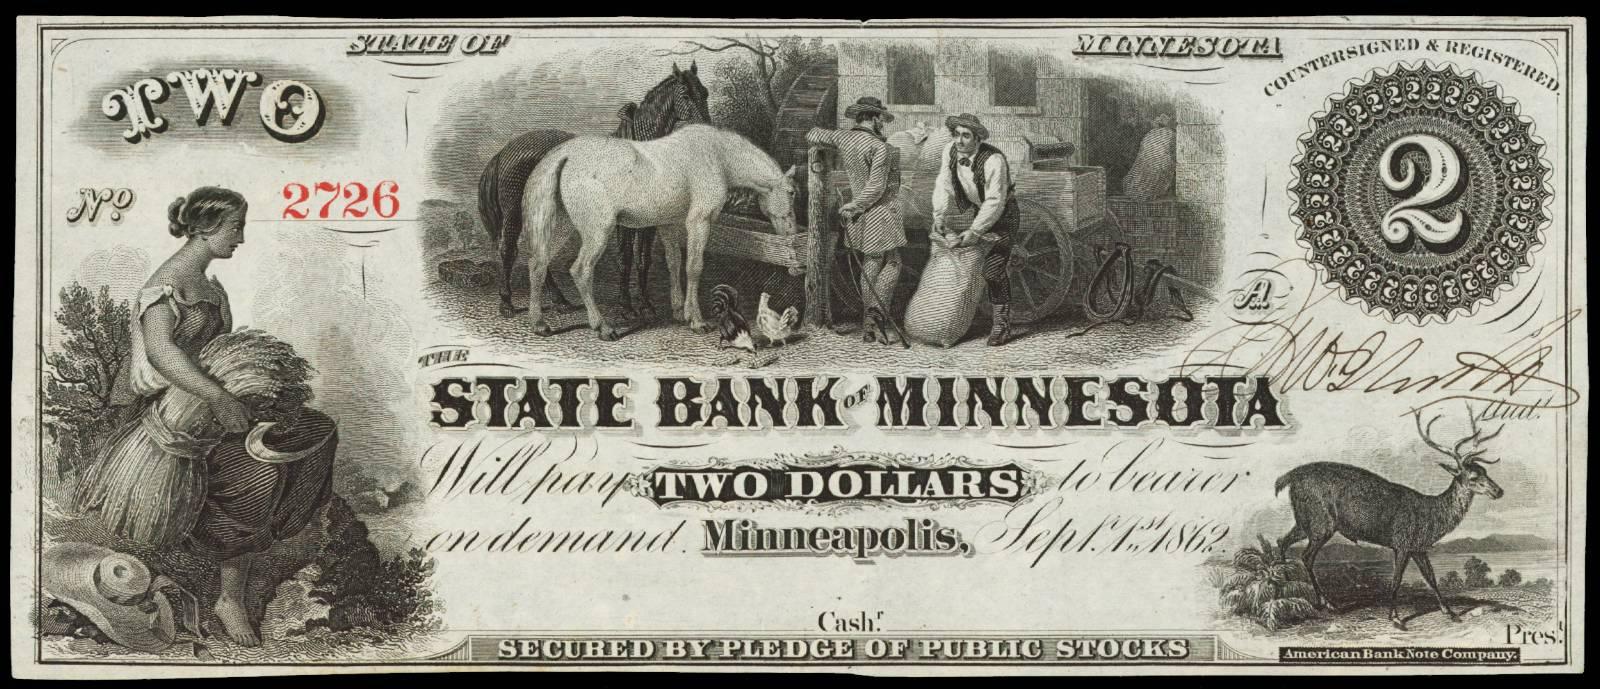 State Bank of Minnesota